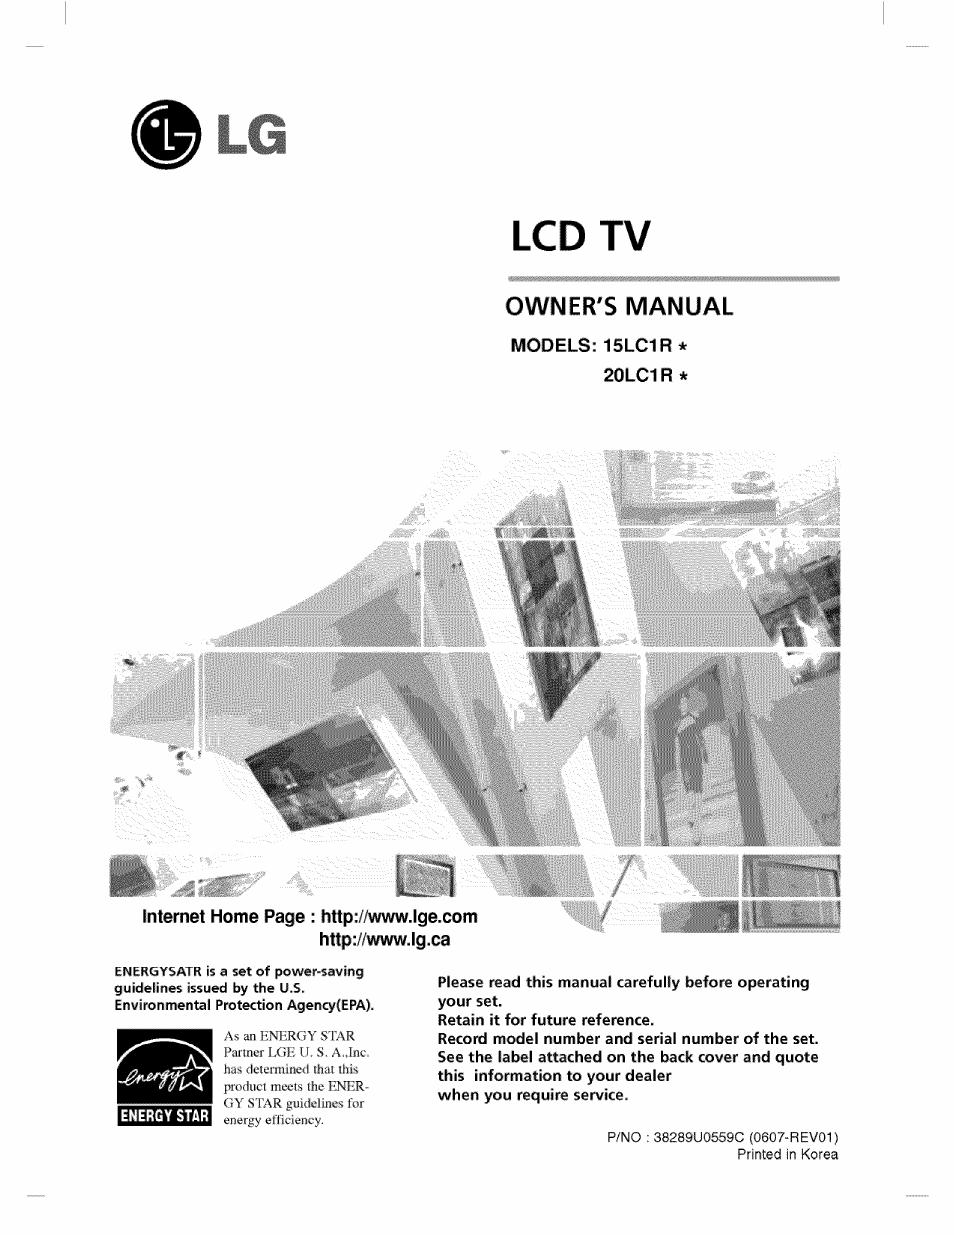 lg 200lc1r user manual 36 pages rh manualsdir com LG Phones Manual LG Cell Phone Manuals